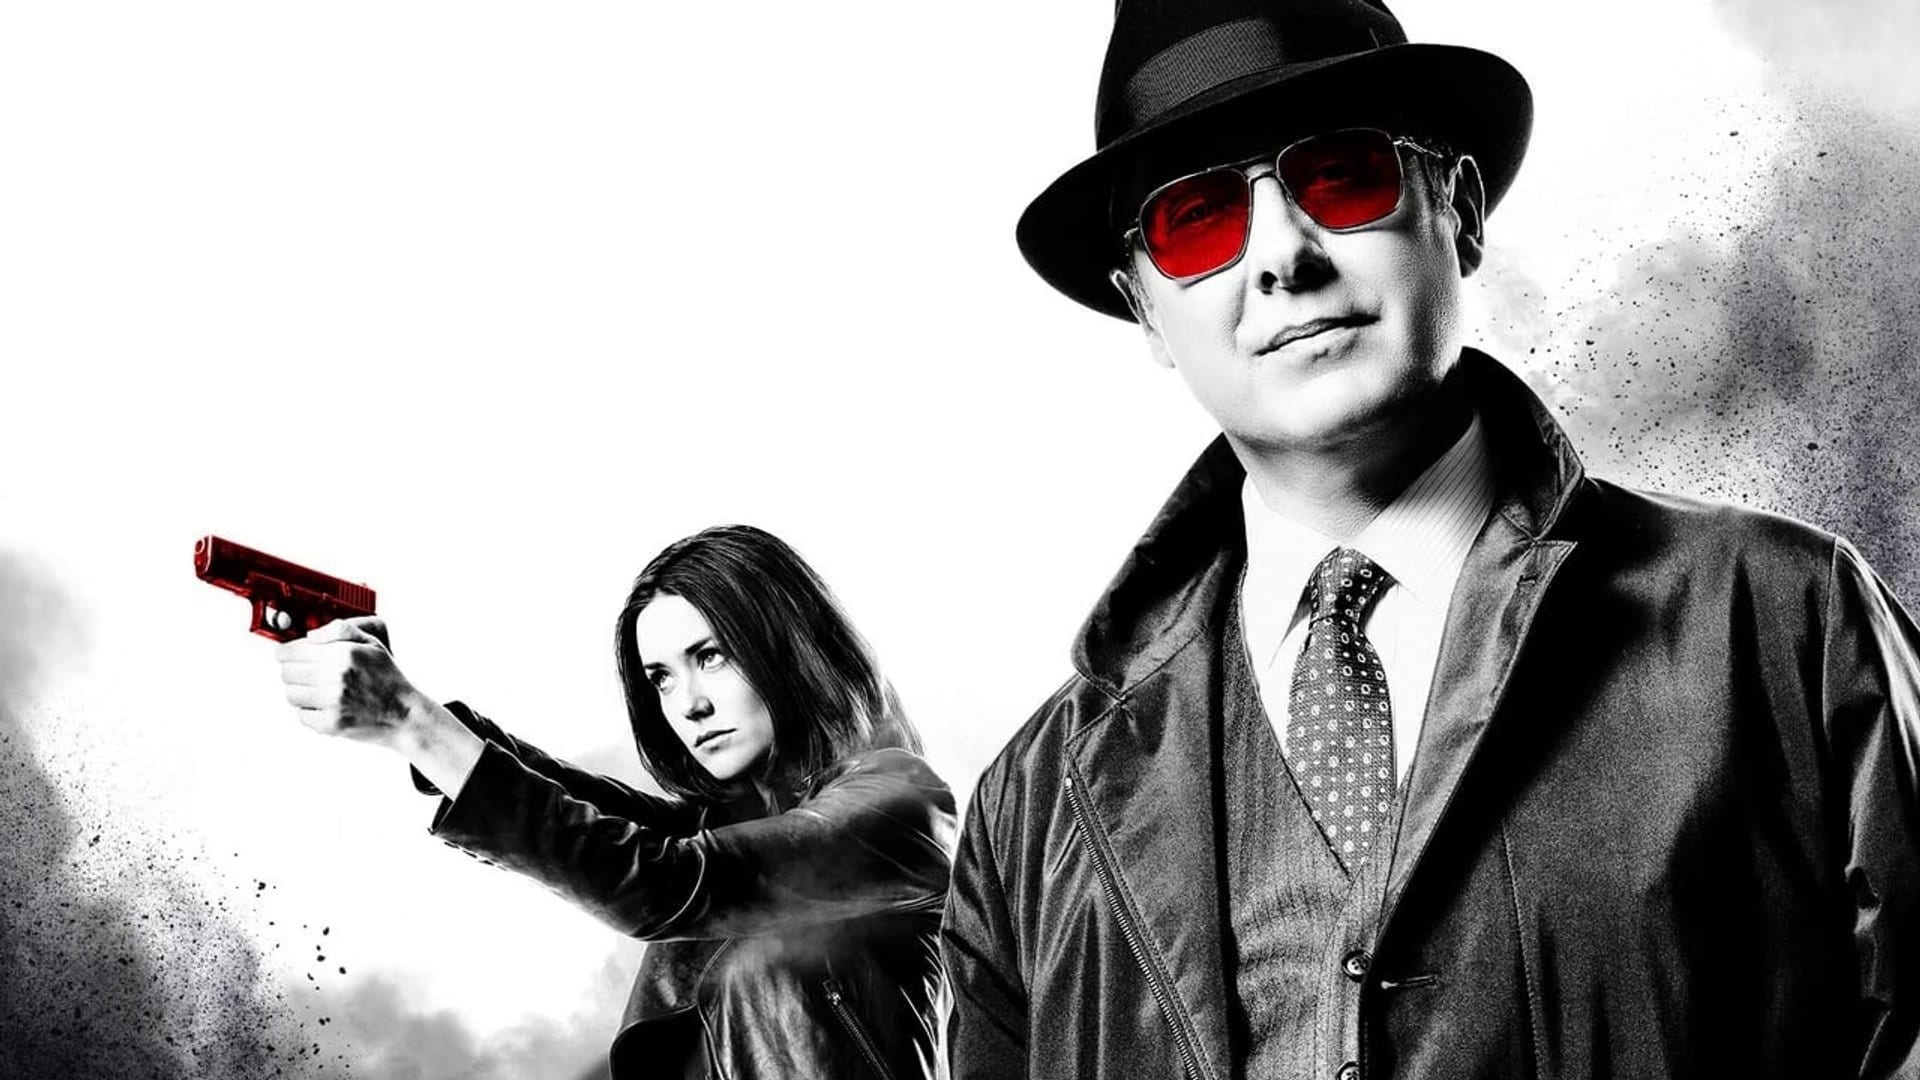 The Blacklist Season 6 Episode 19